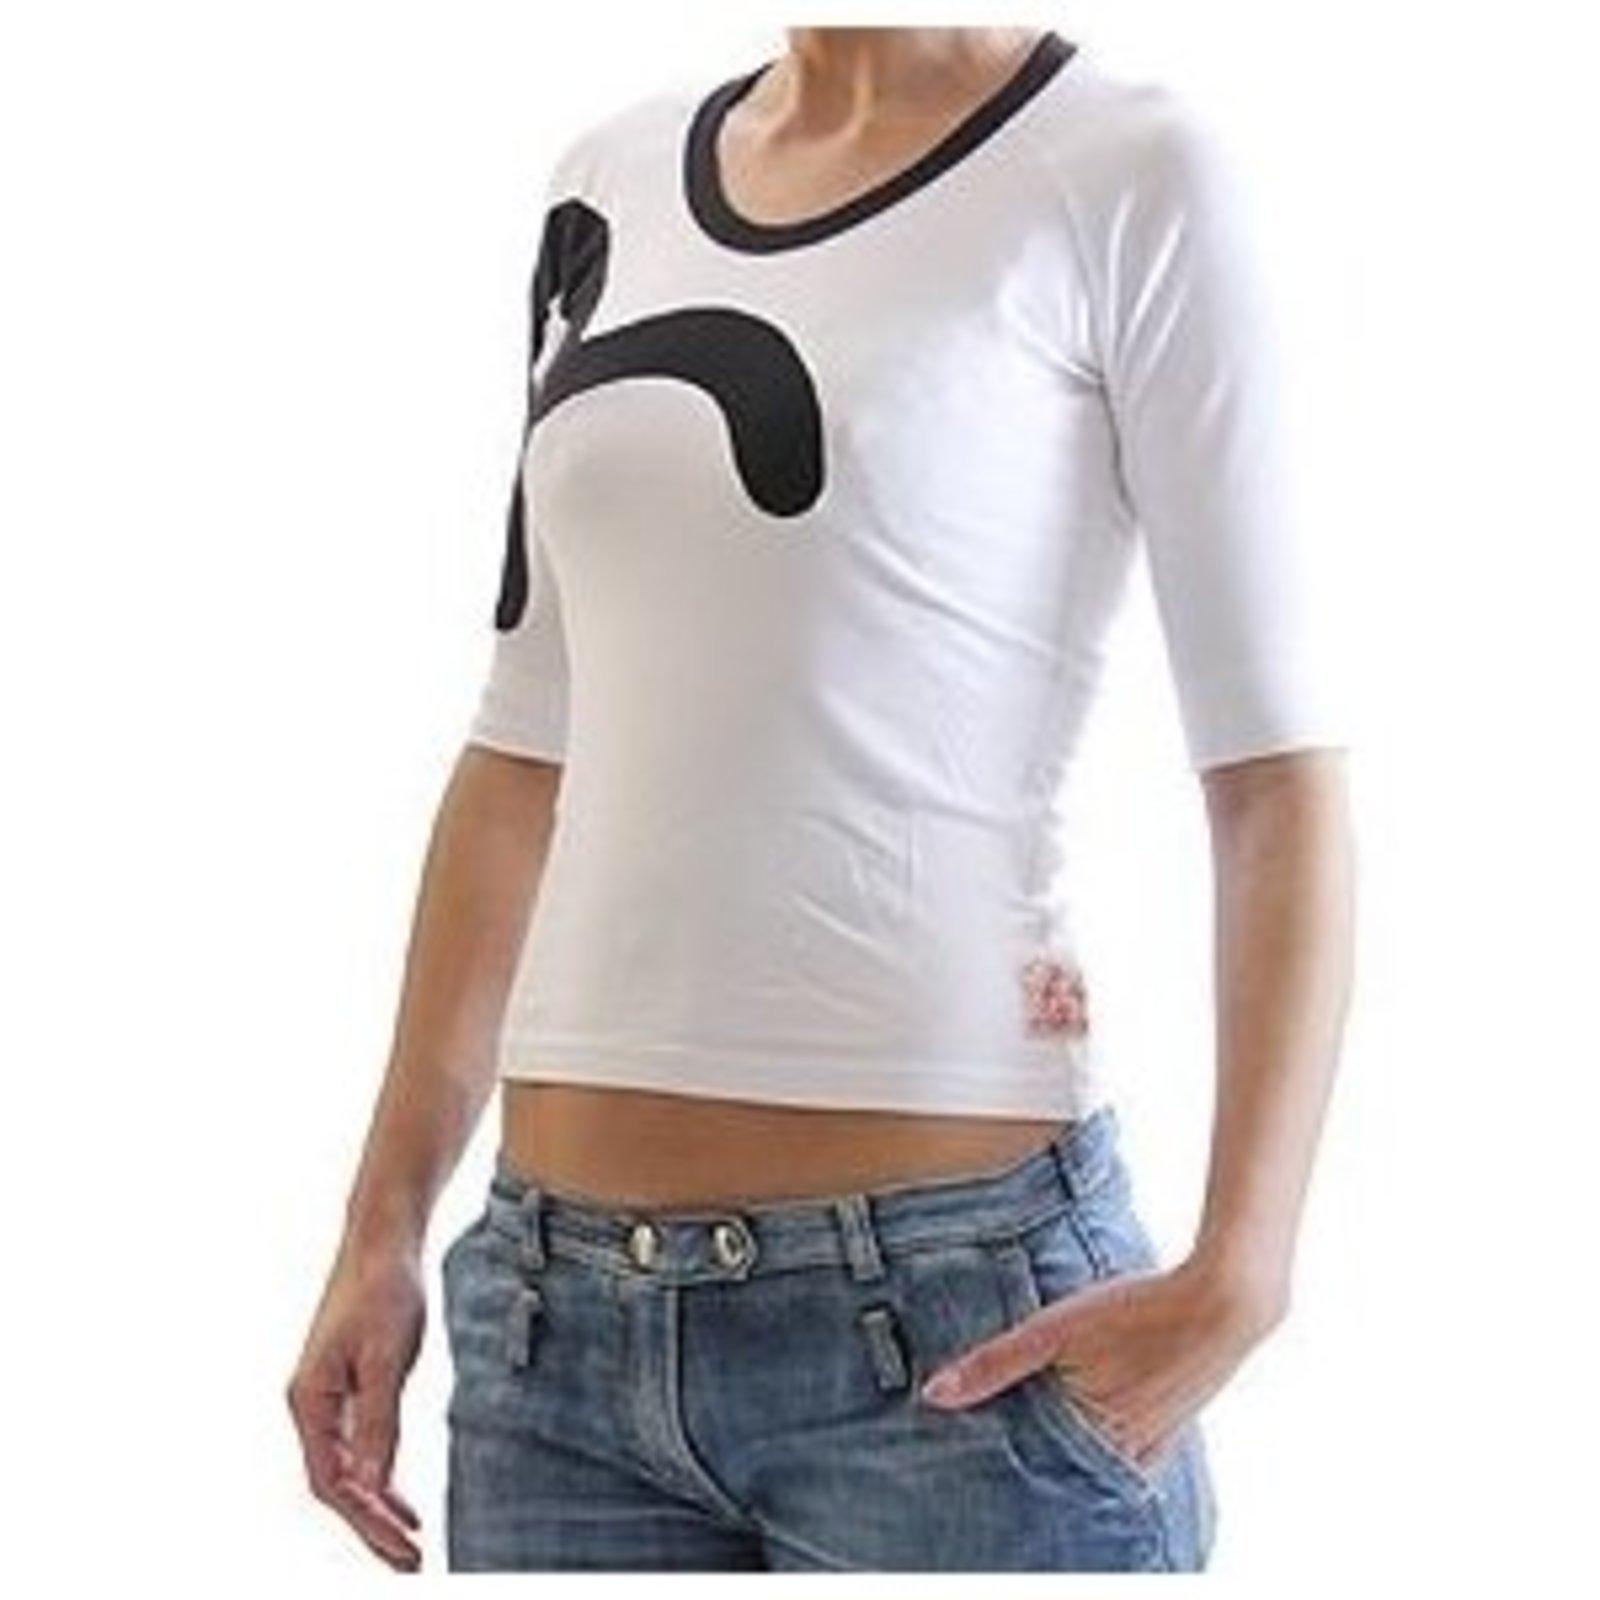 52230b2edc07 Evisu White Stretch T Shirt for Women with Black Collar Trim and Logo Insert  EVIS0510